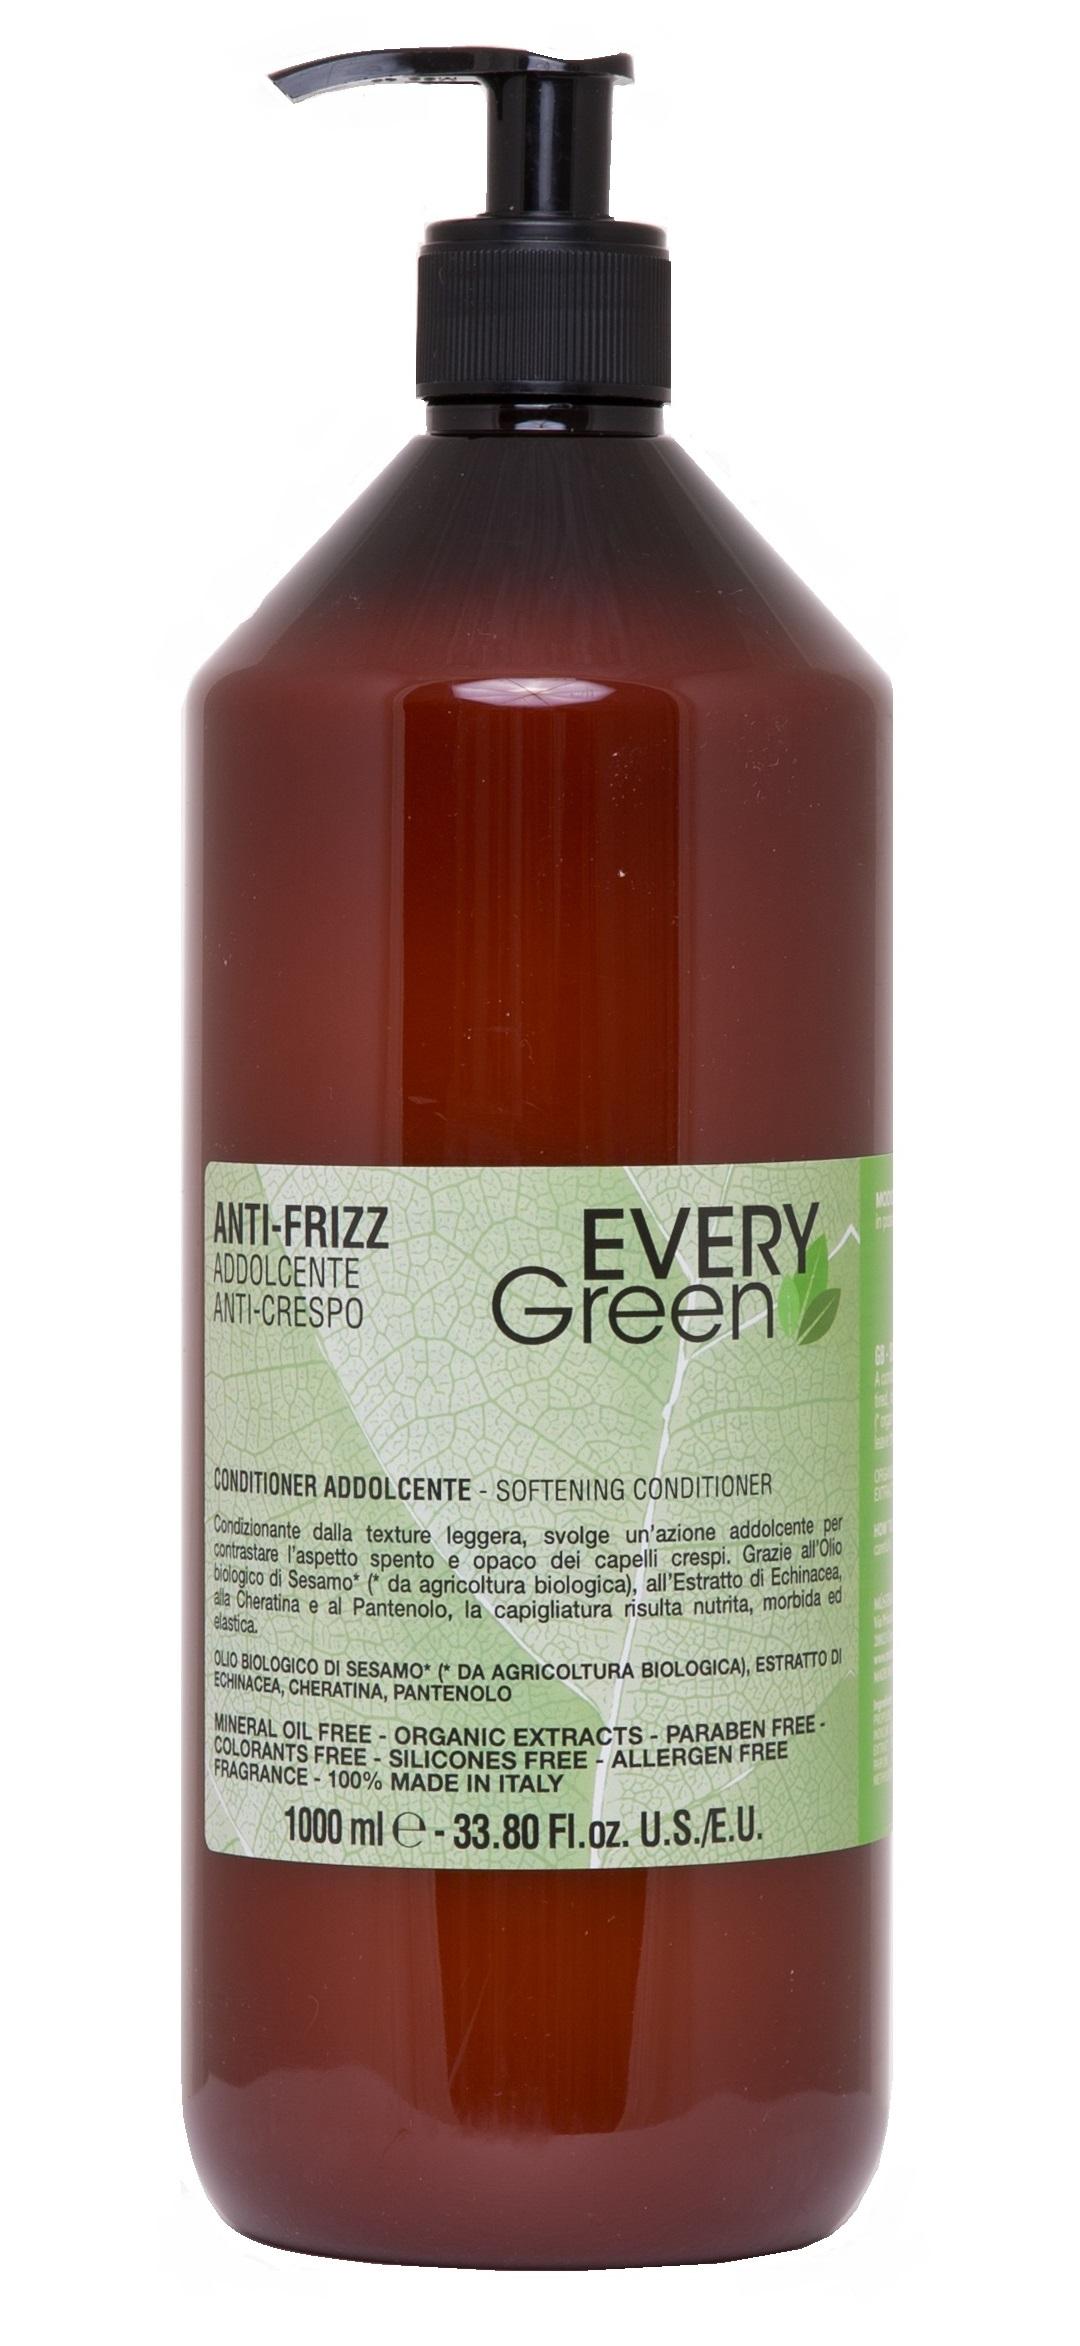 Dikson Кондиционер Every Green Anti-Frizz Condizionante Idratante для Вьющихся Волос, 1000 мл